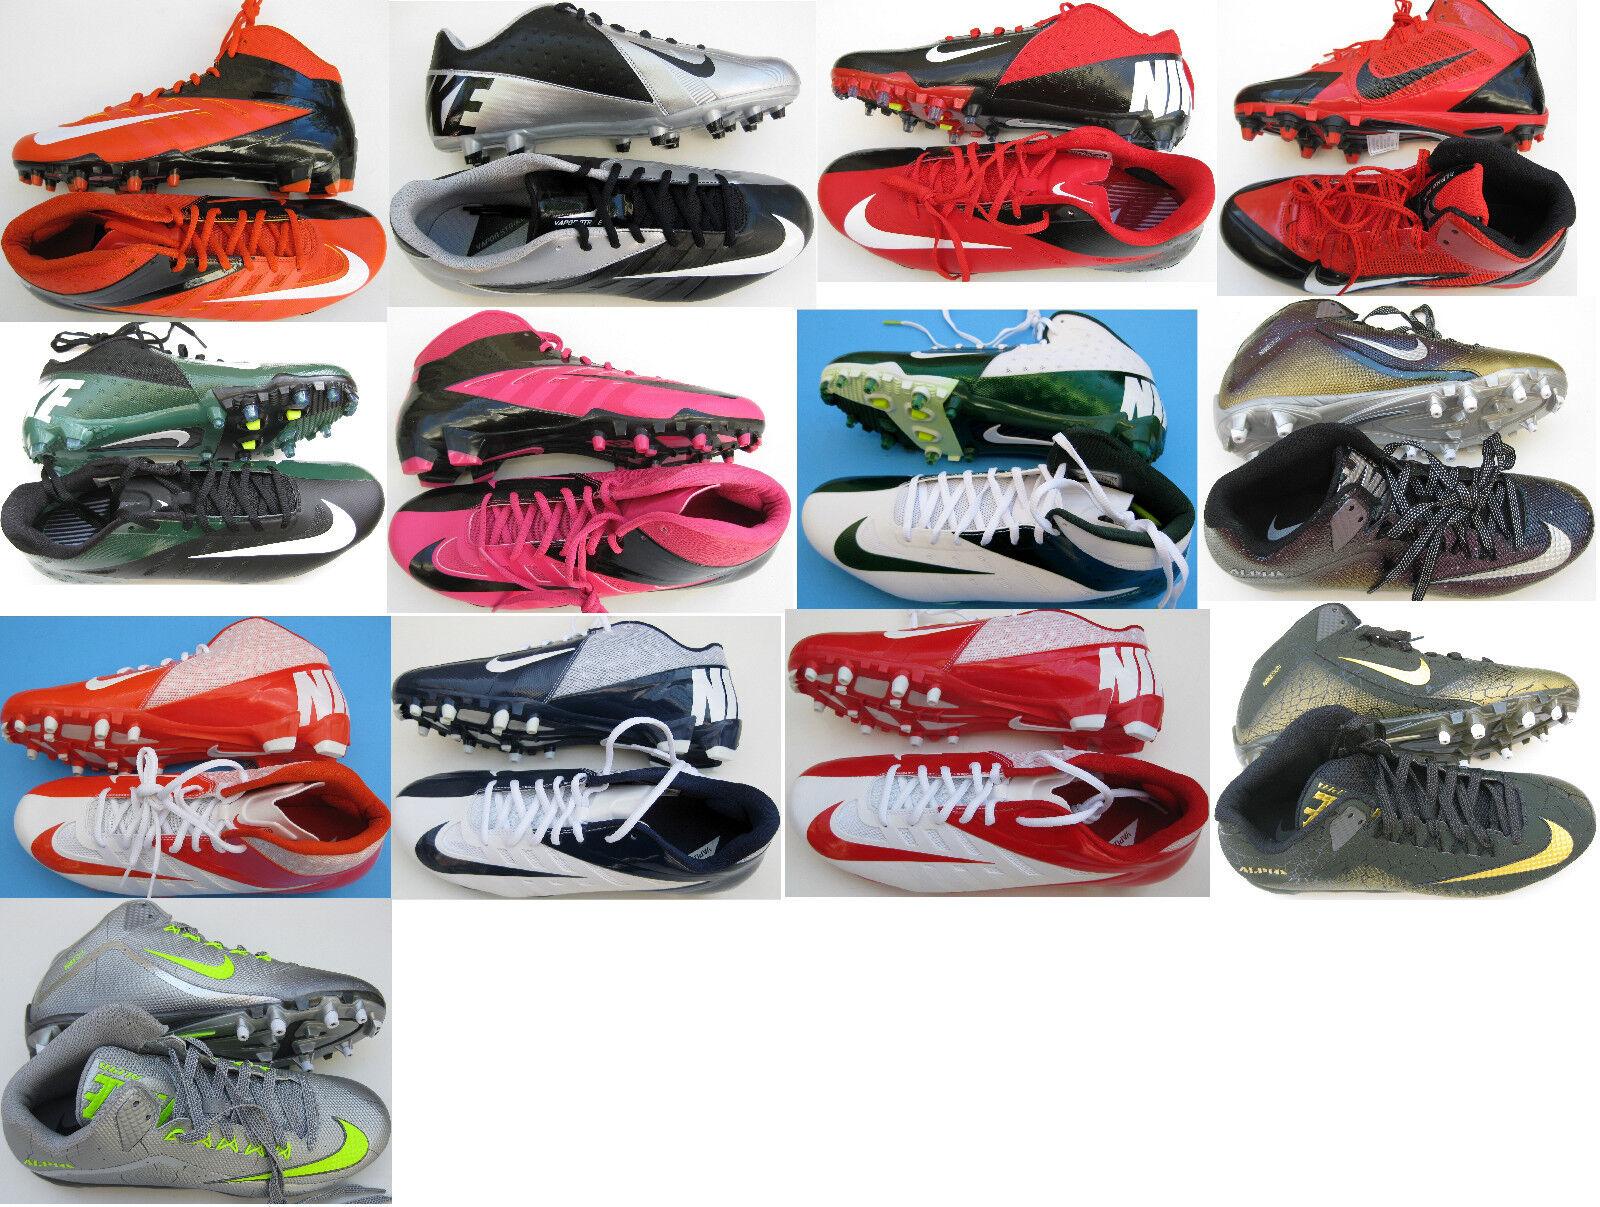 New Nike Vapor Strike/elite Low,Alpha Pro 3/4 Mid Mens Football Cleats Pck 1